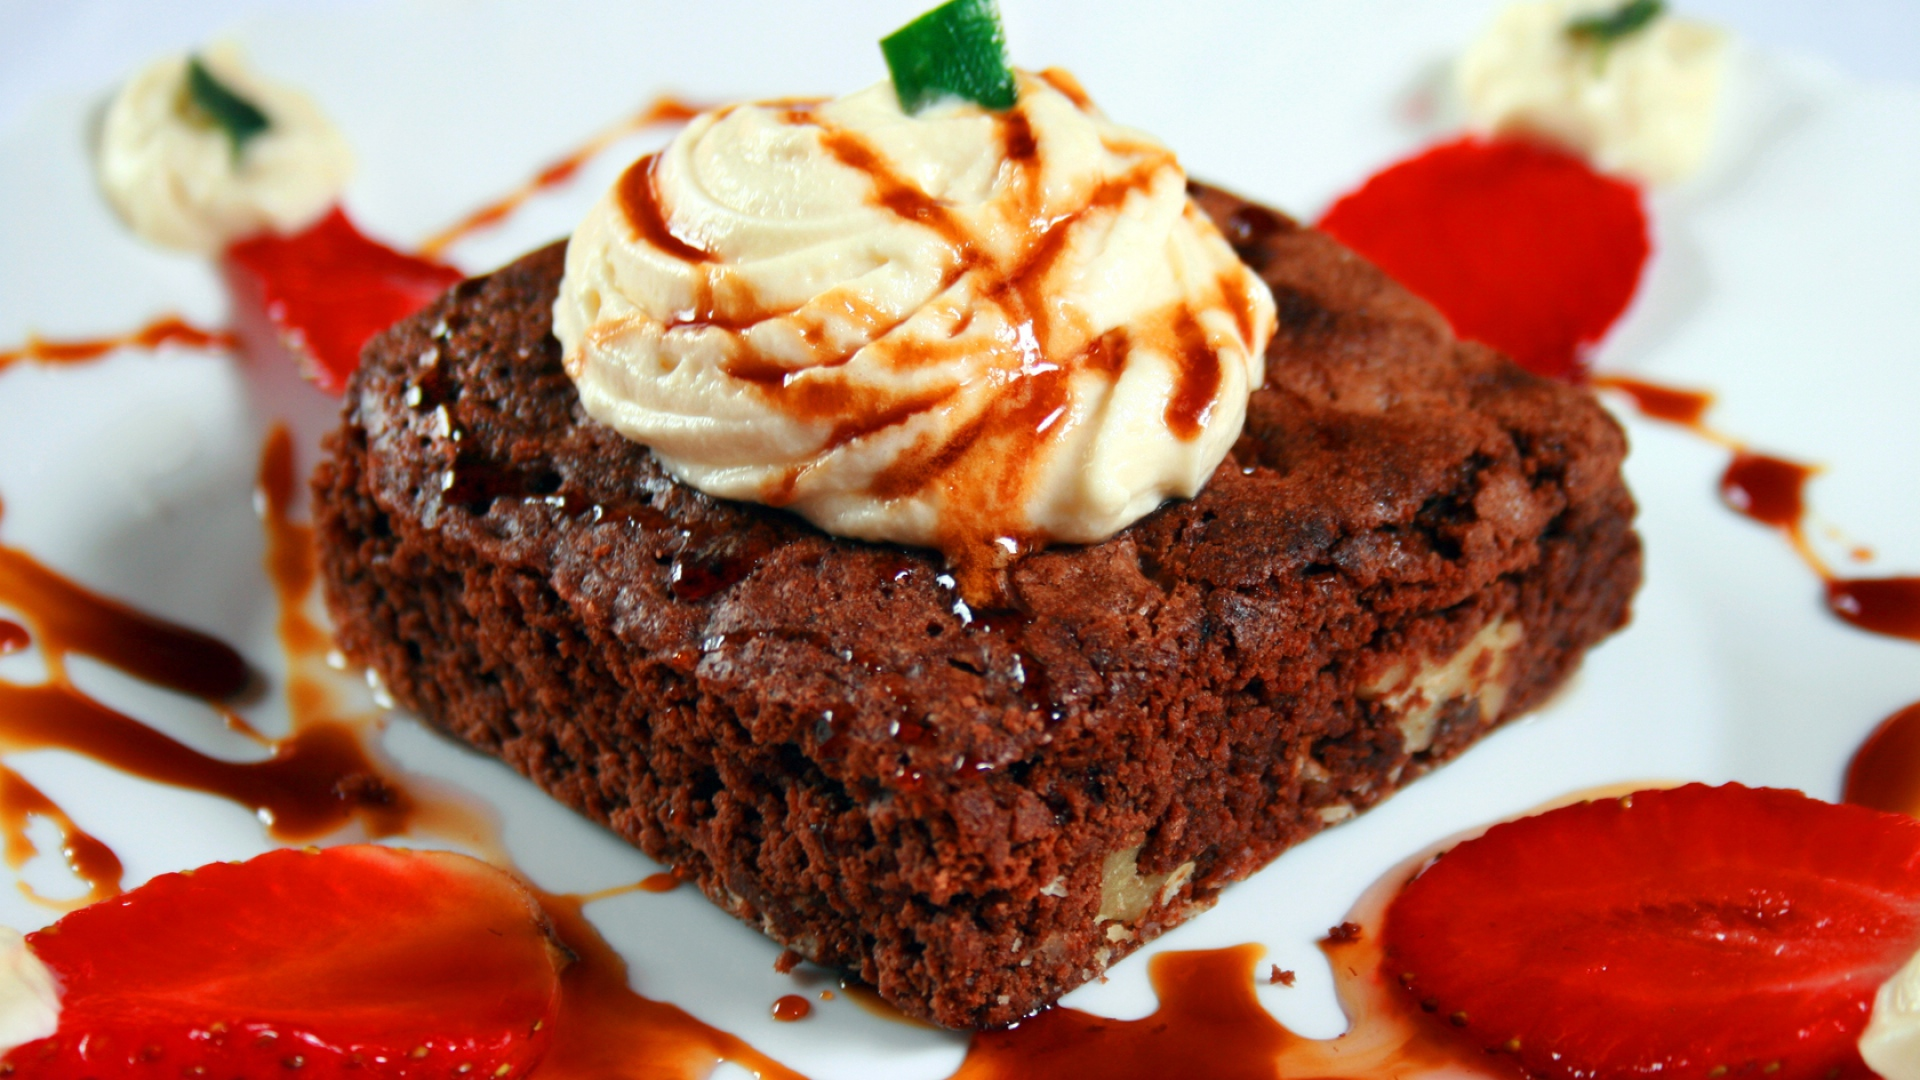 download wallpaper 1920x1080 cake, sauce, strawberry, dessert